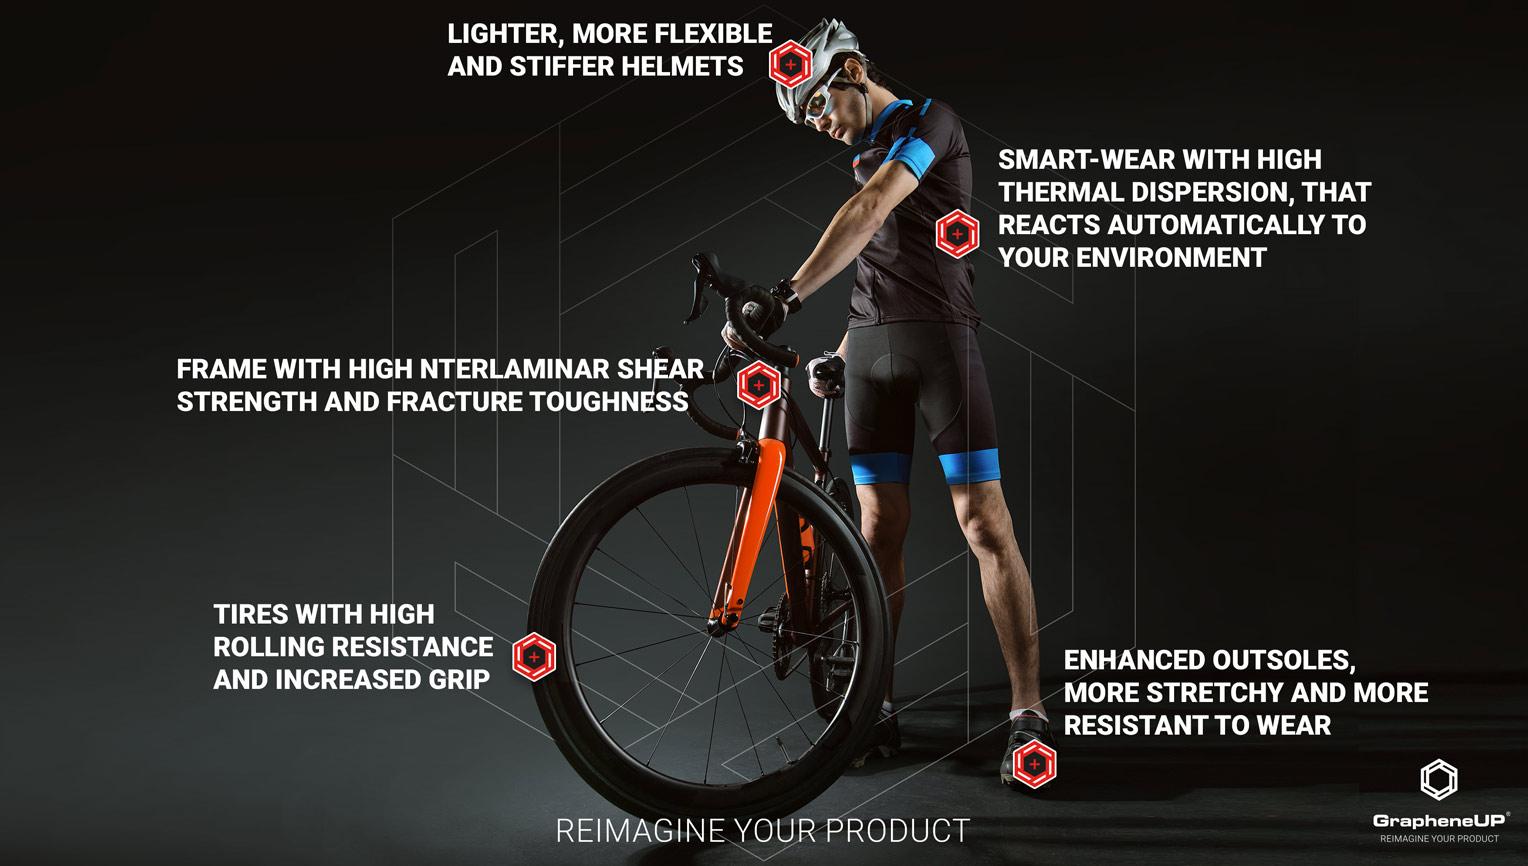 graphene enhanced product cyclists